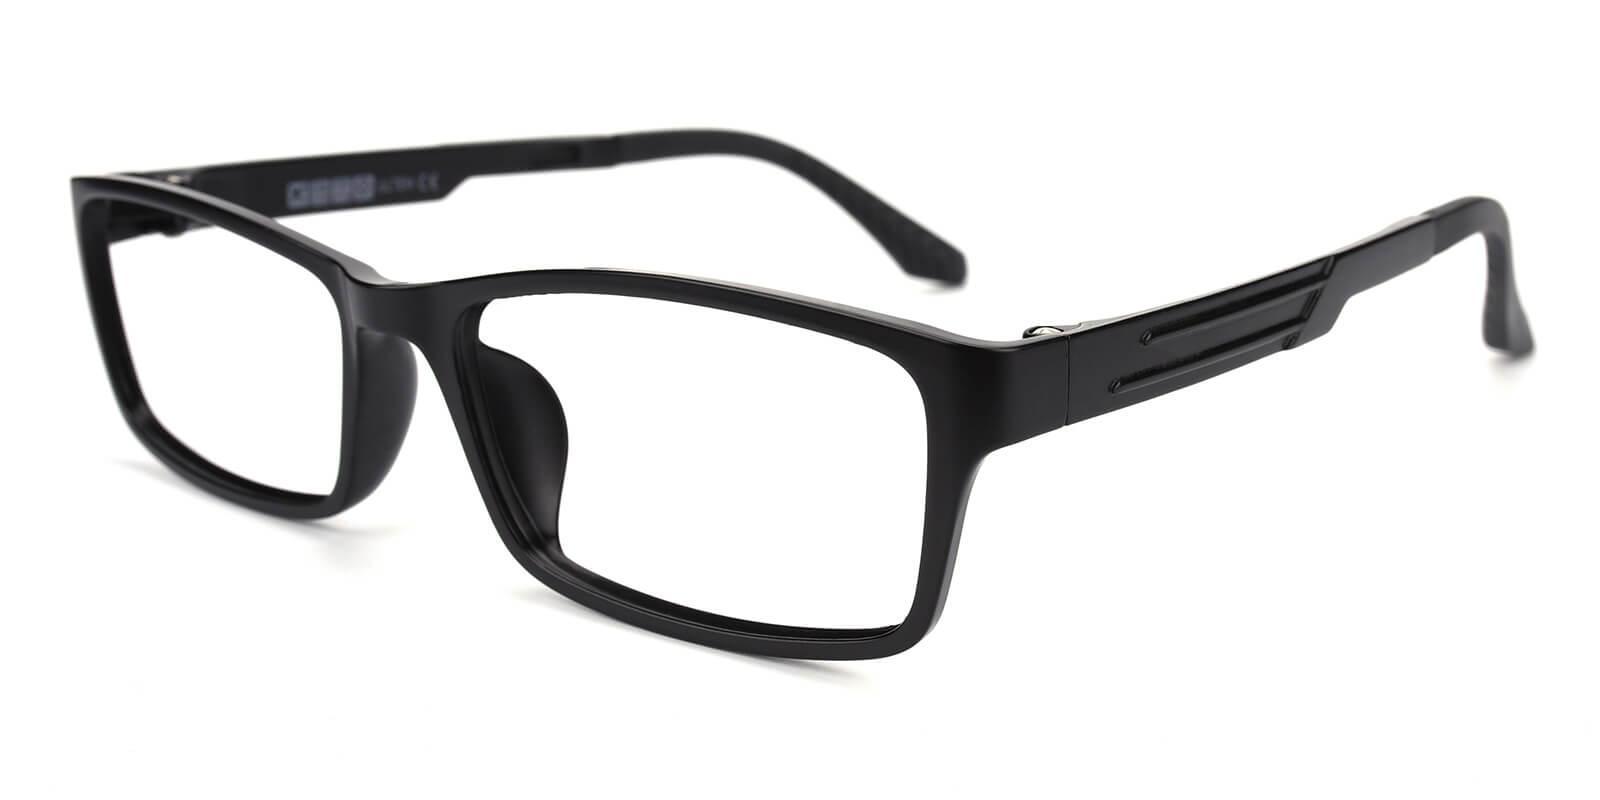 Evidina-Black-Rectangle-Plastic-Eyeglasses-additional1